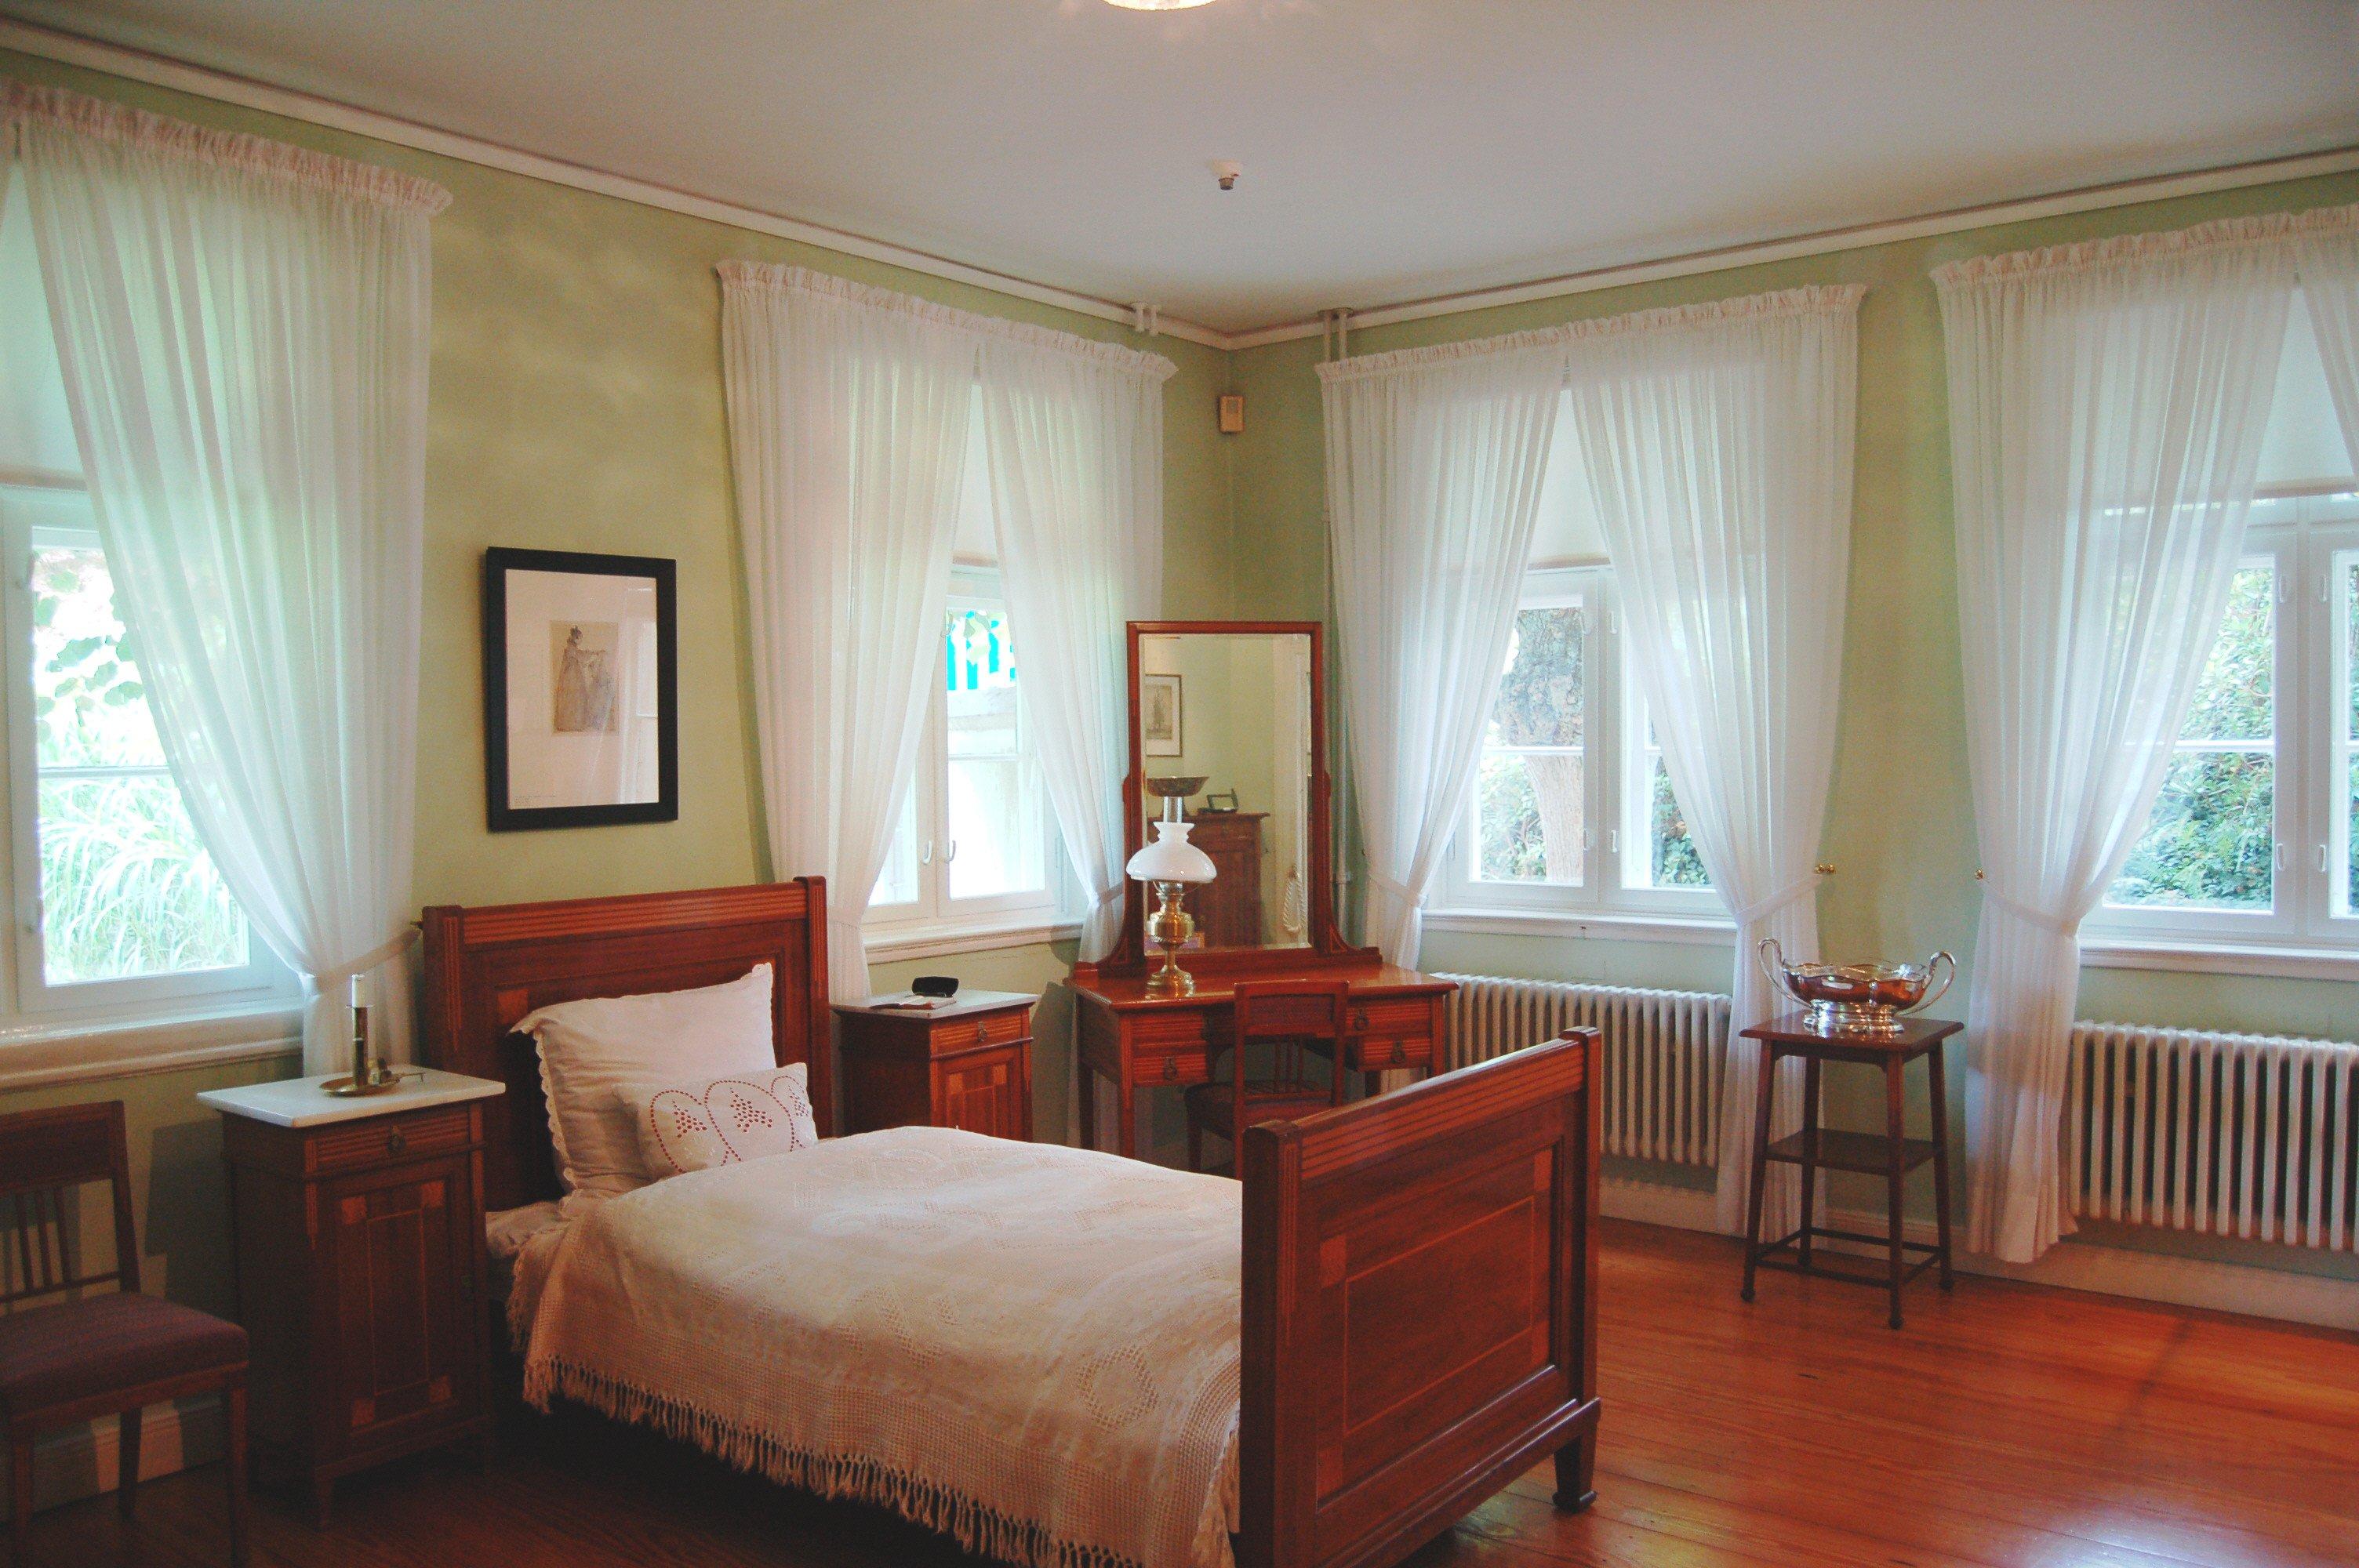 Used King Bedroom Set New Bedroom